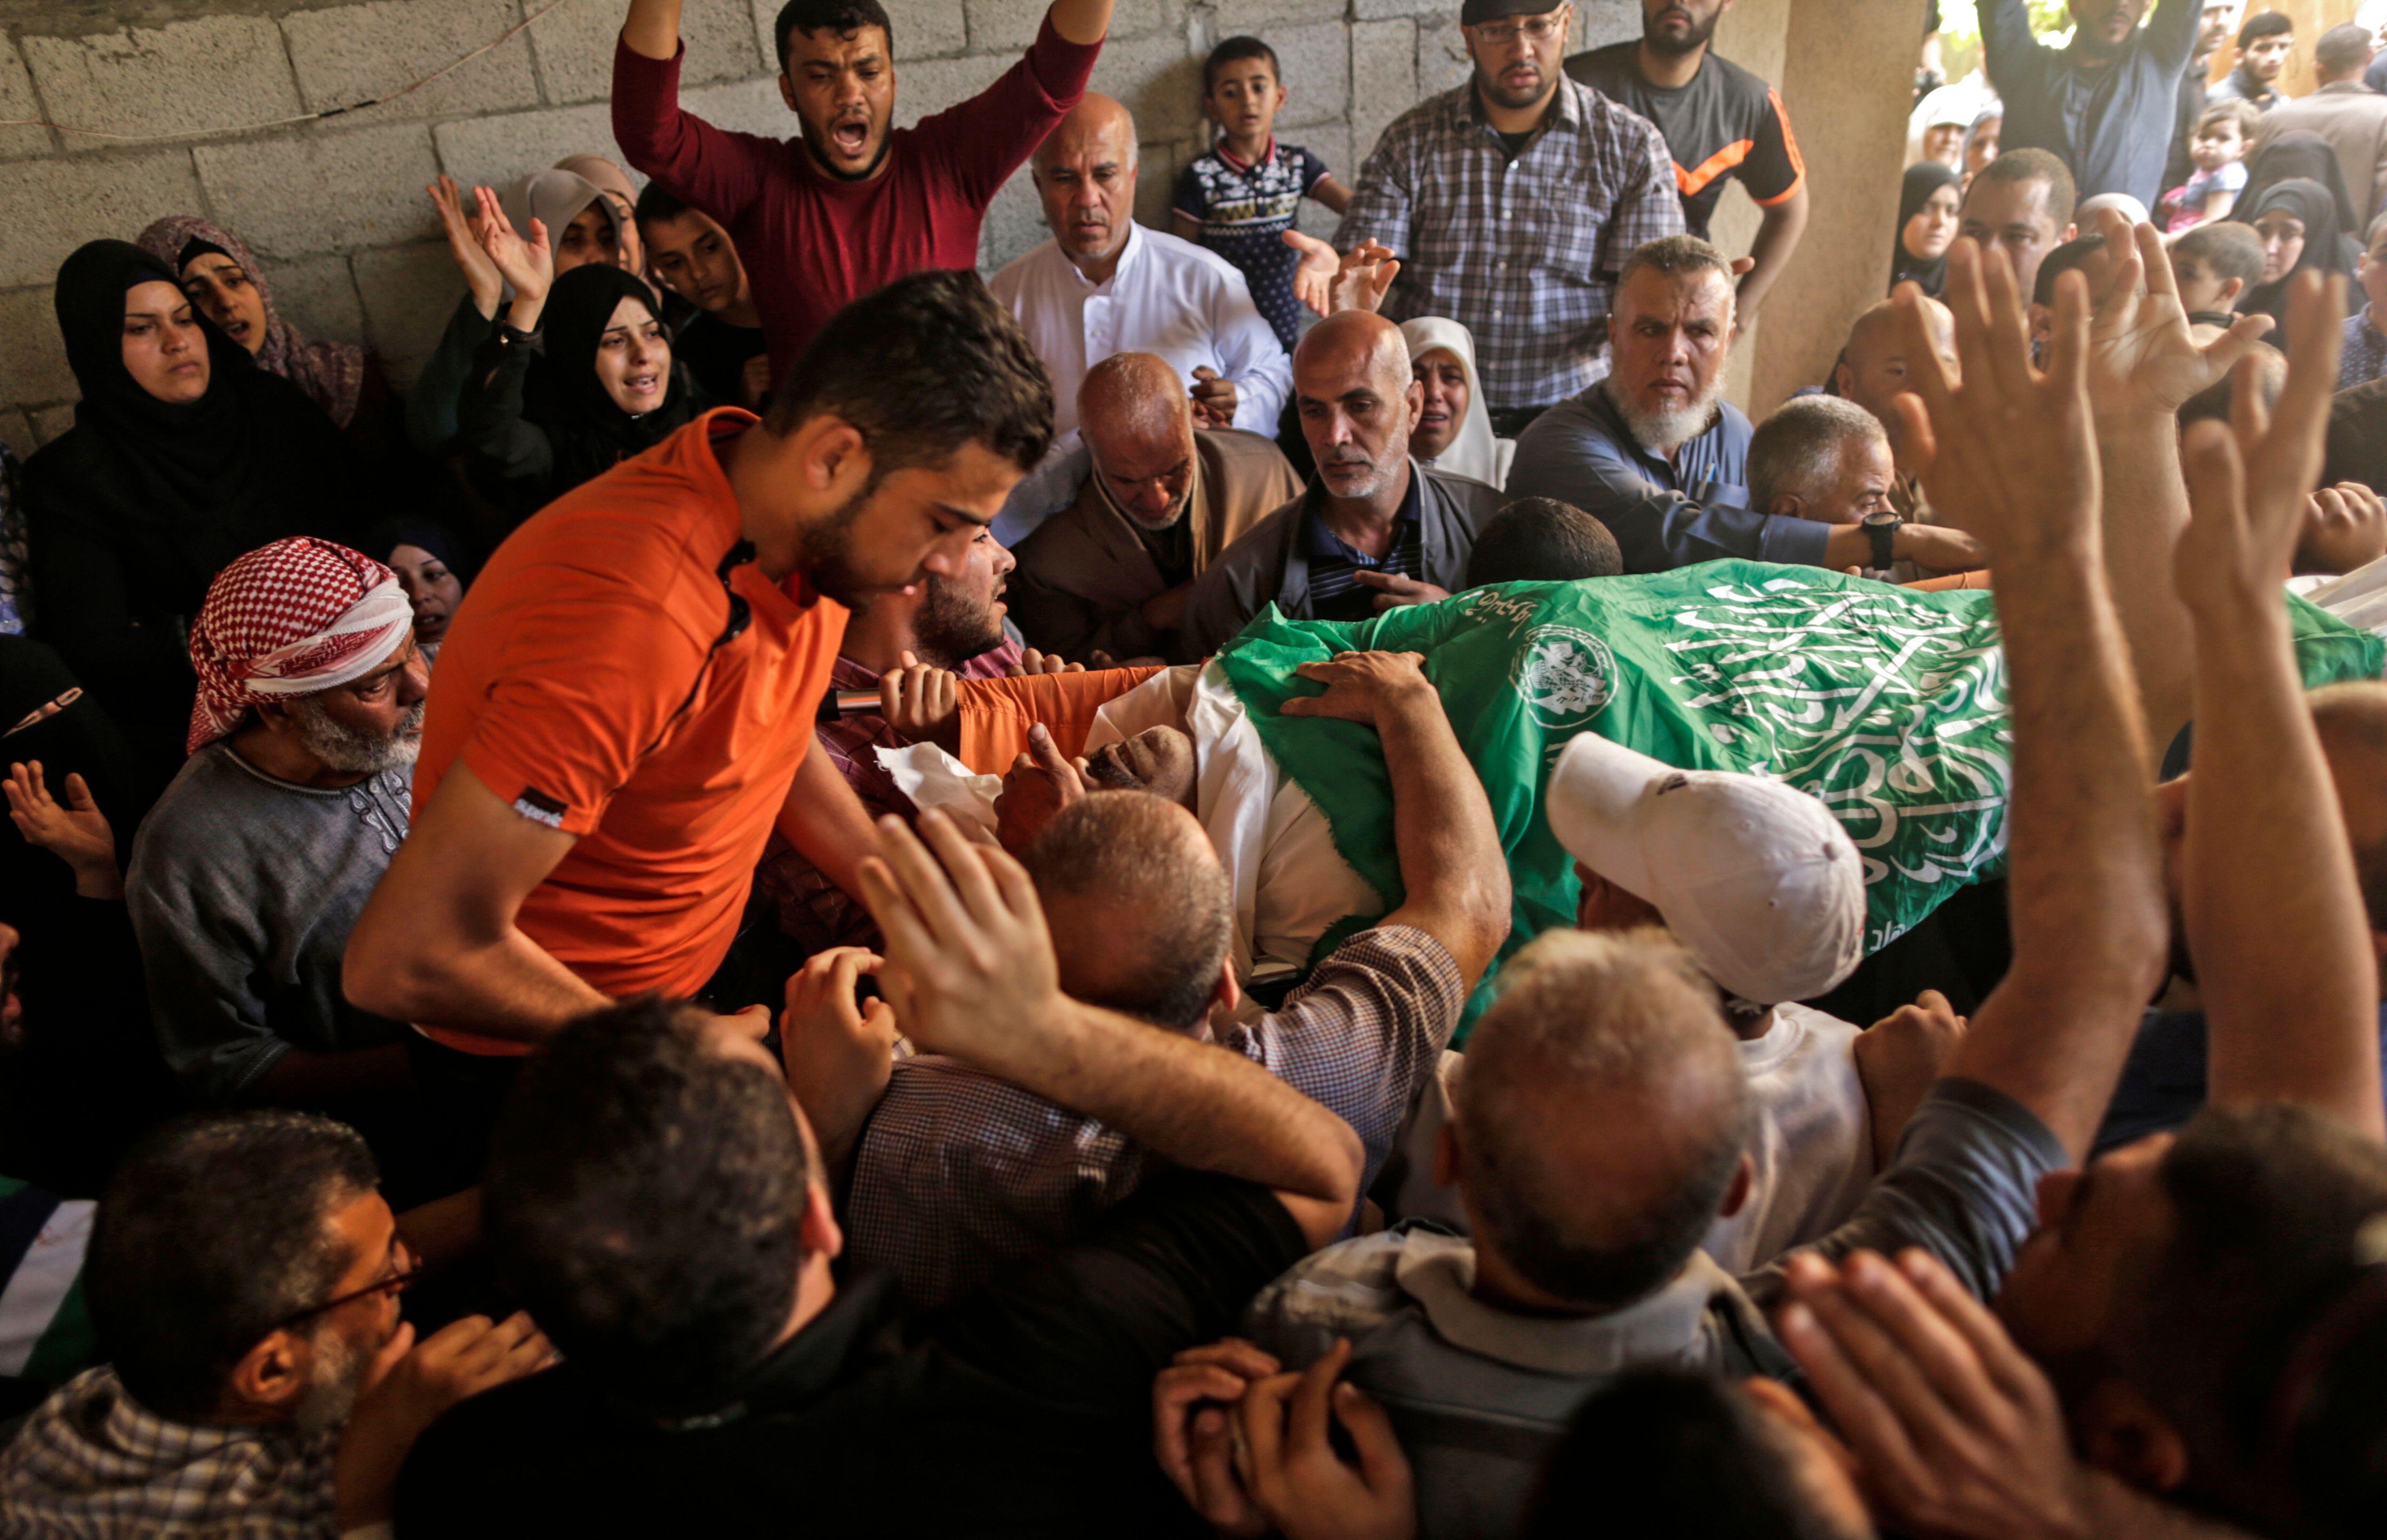 تشييع جثمان الشهيد ناصر غراب  (1)